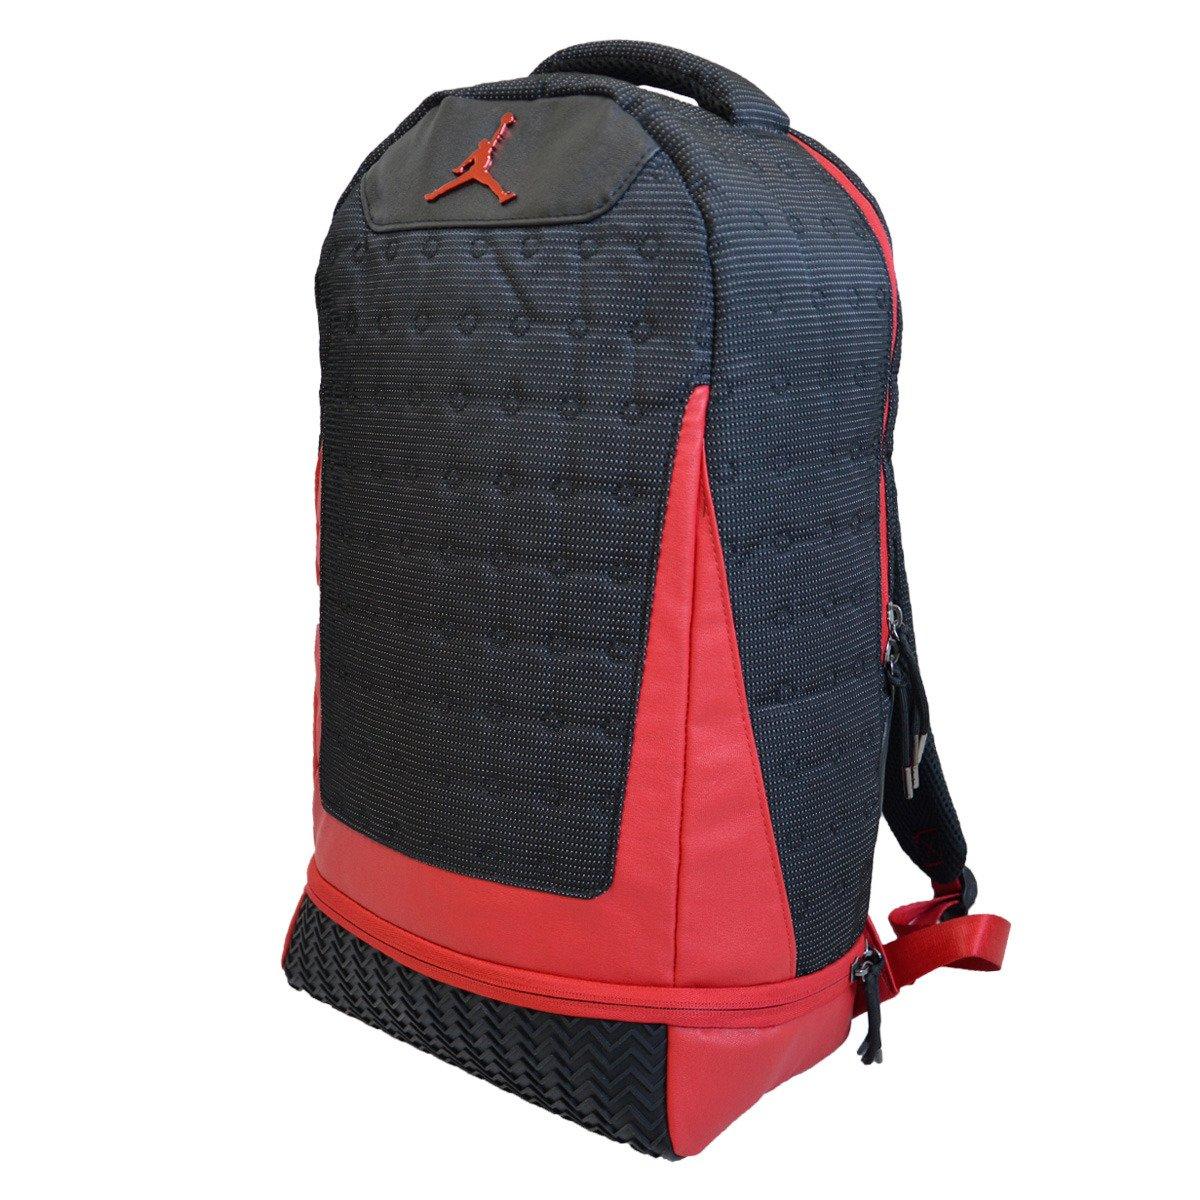 d0a82570f195 Air Jordan Retro 13 Backpack - 9A1898-KR5